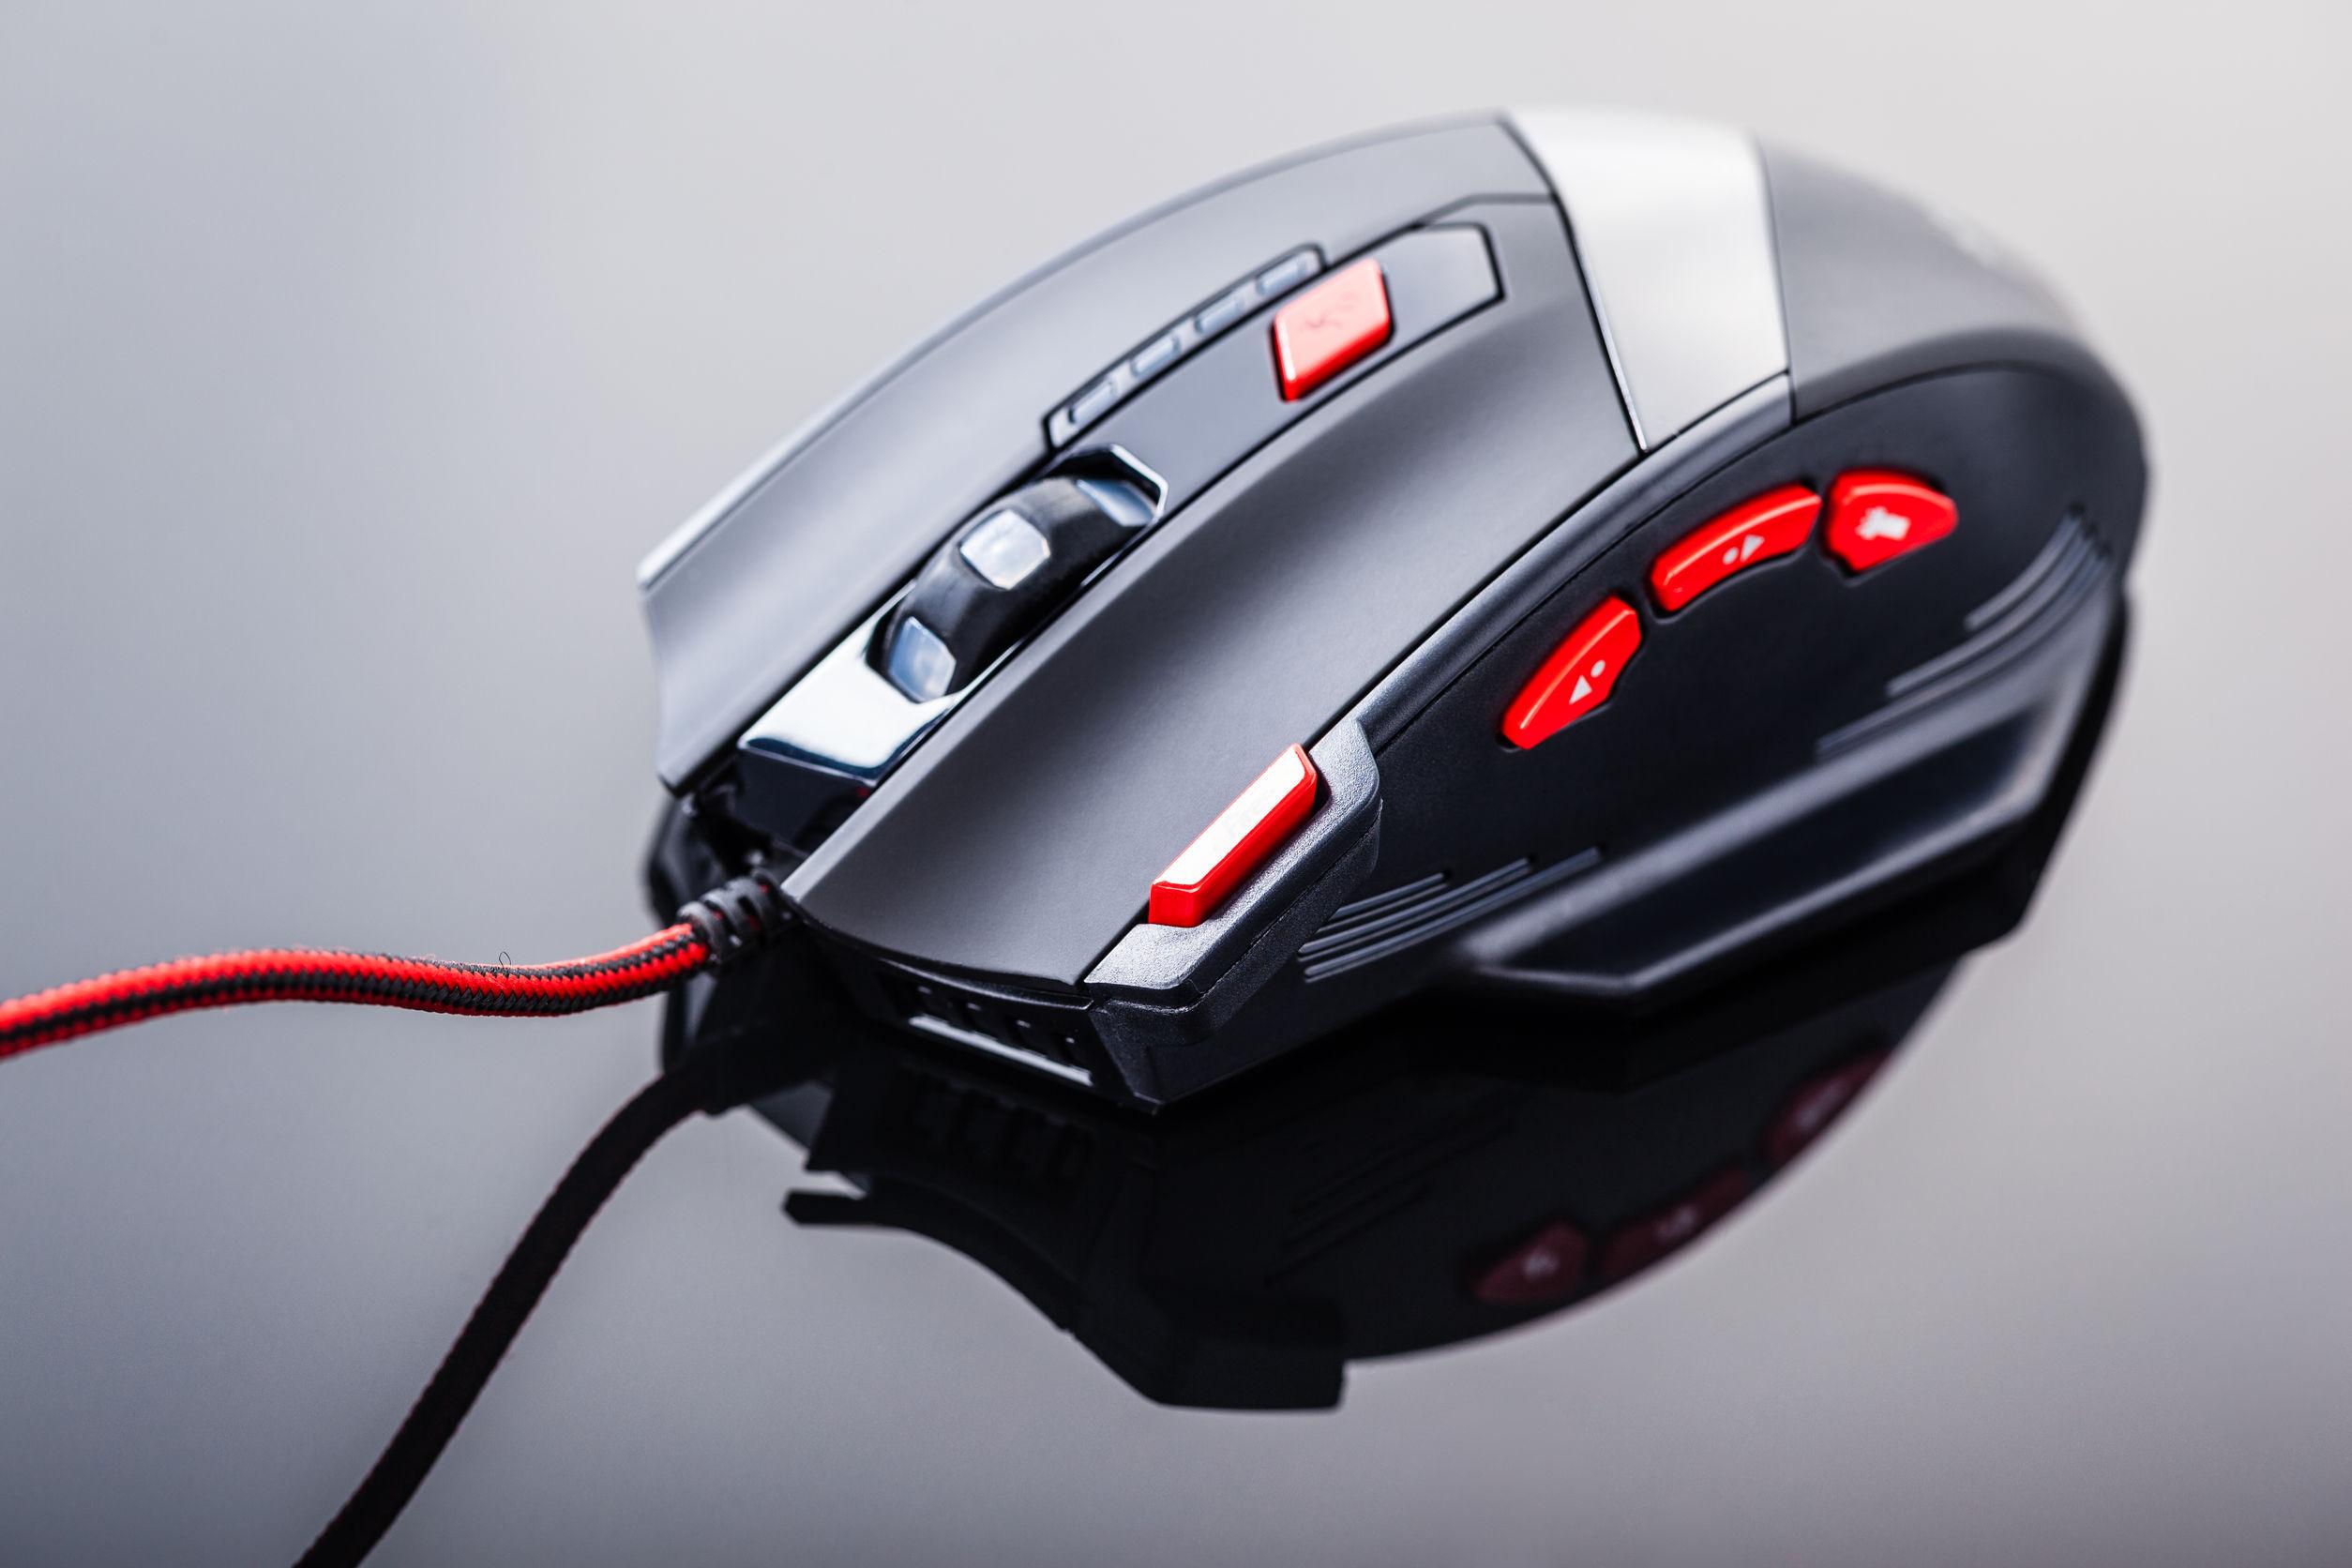 Mouse gamer: ¿Cuál es el mejor del 2021?